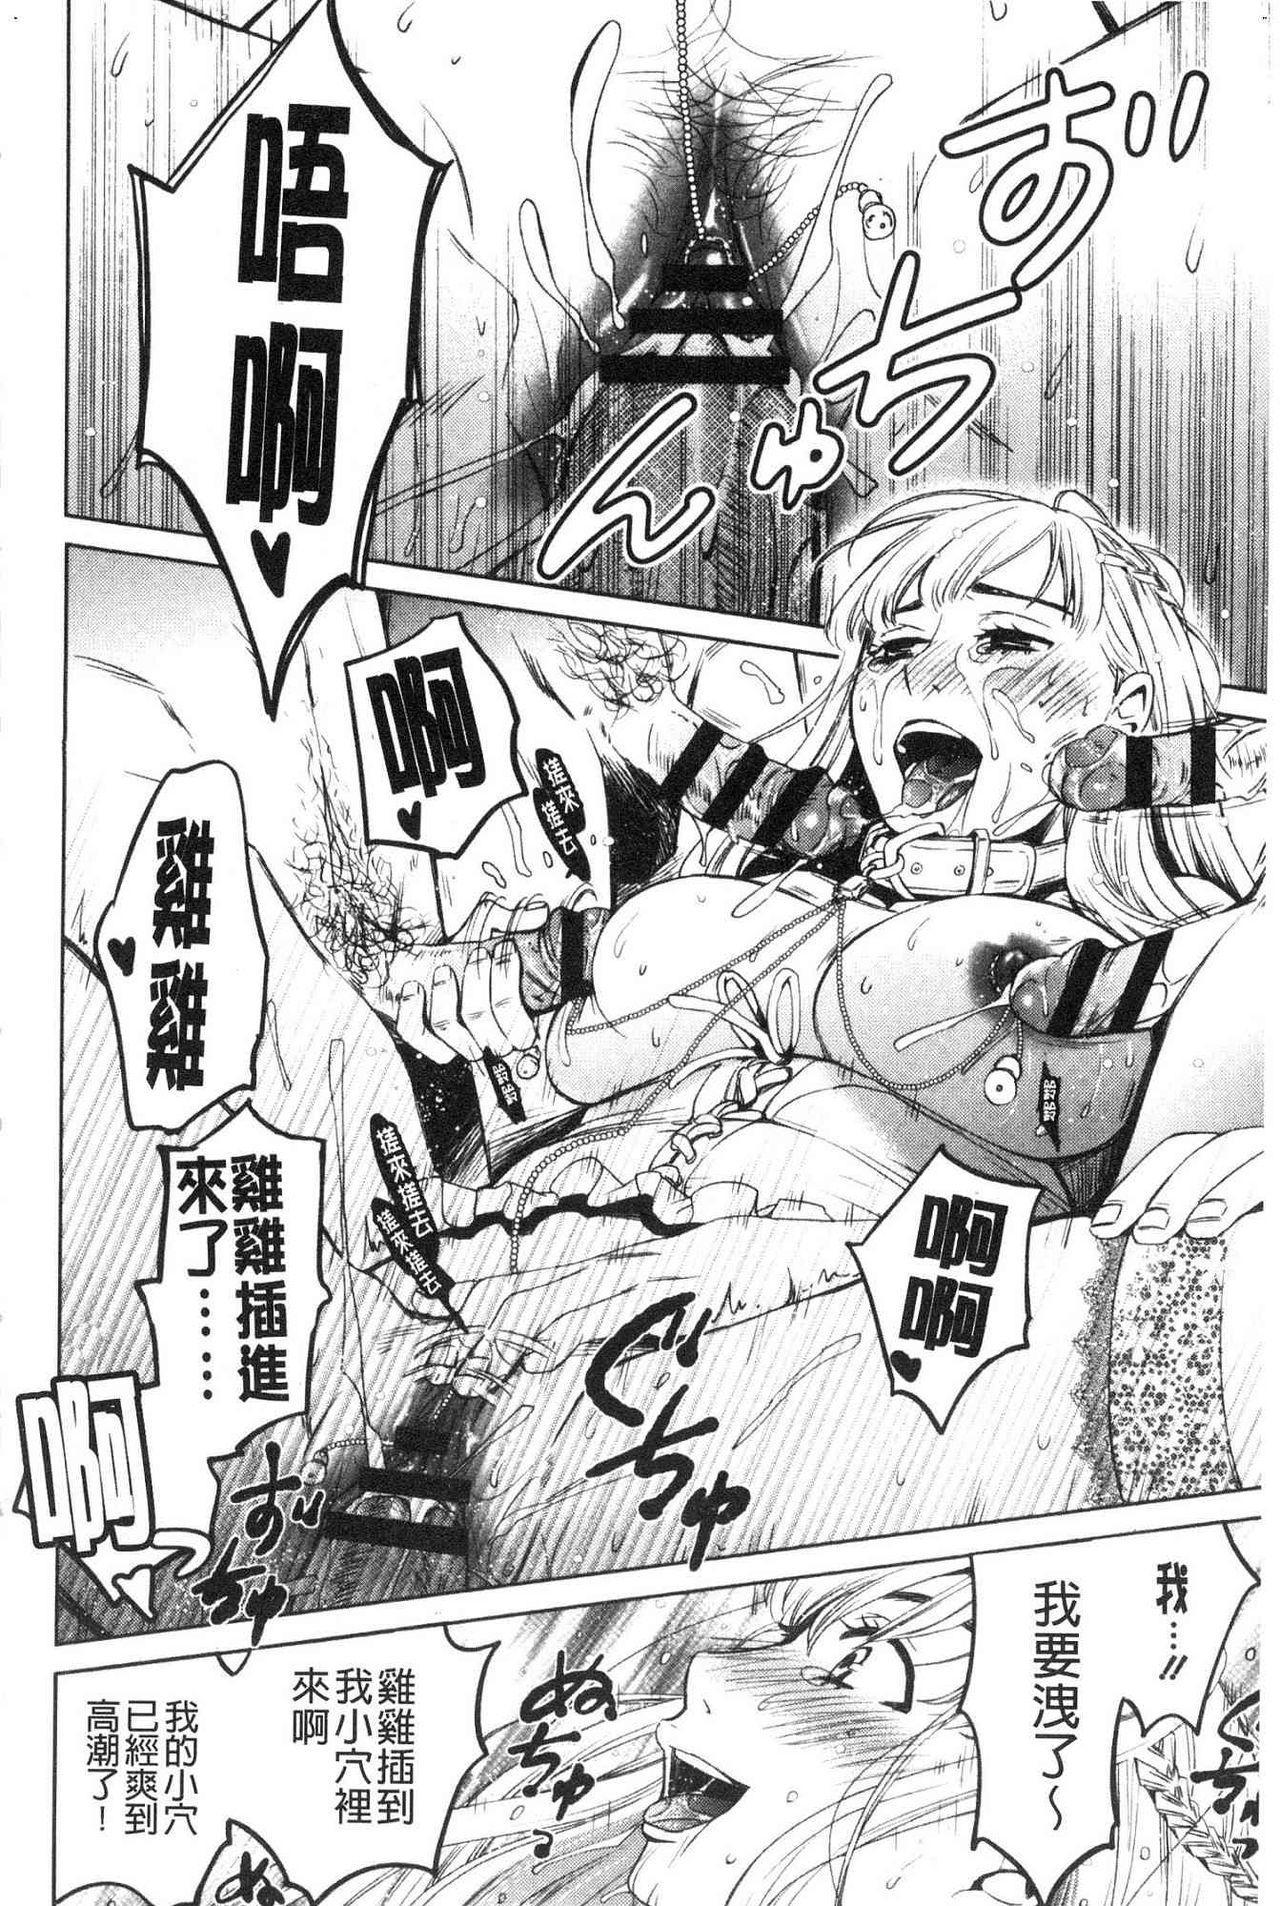 [Gotoh Akira]  21-ji no Onna ~Camera no Mae no Mesuinu~ 2 | 21時之女 ~鏡頭前的牝犬~ 2 [Chinese] 175